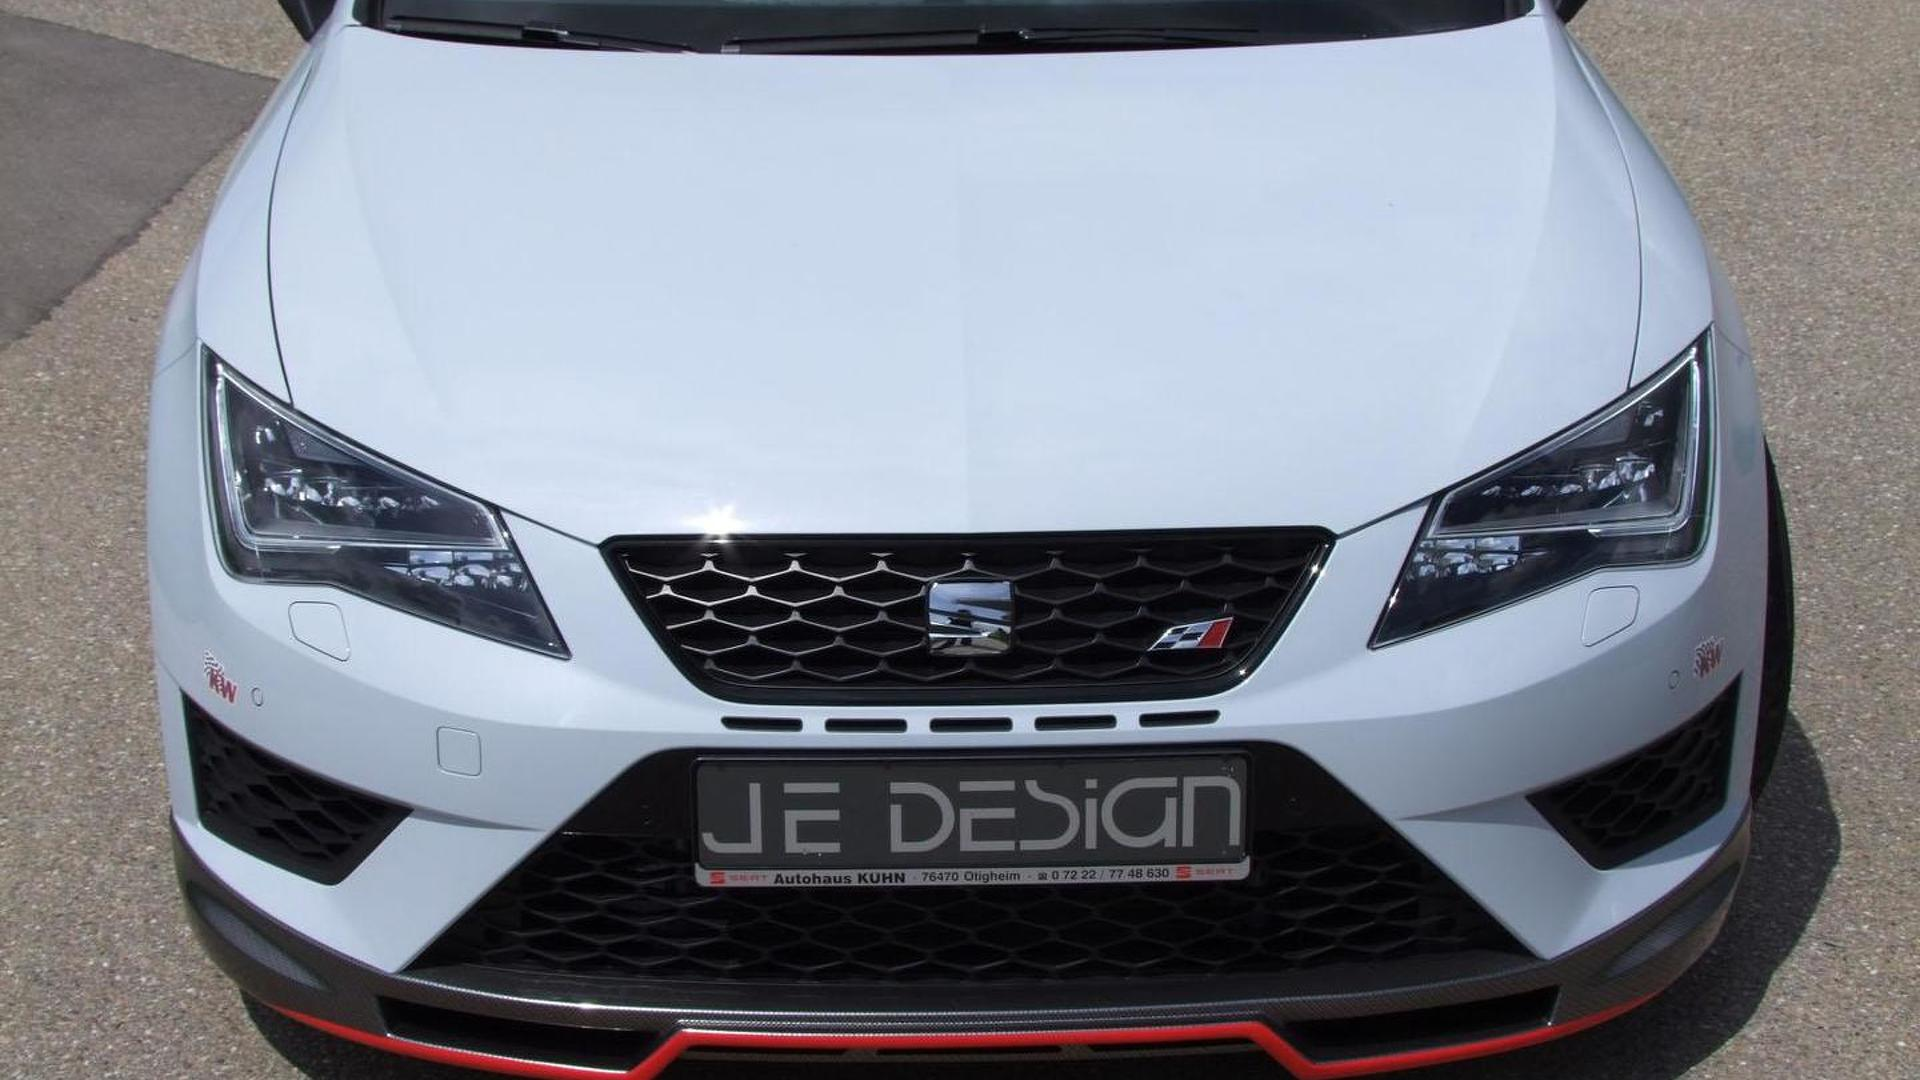 Бампер SEAT Leon Cupra 280 от JE Design